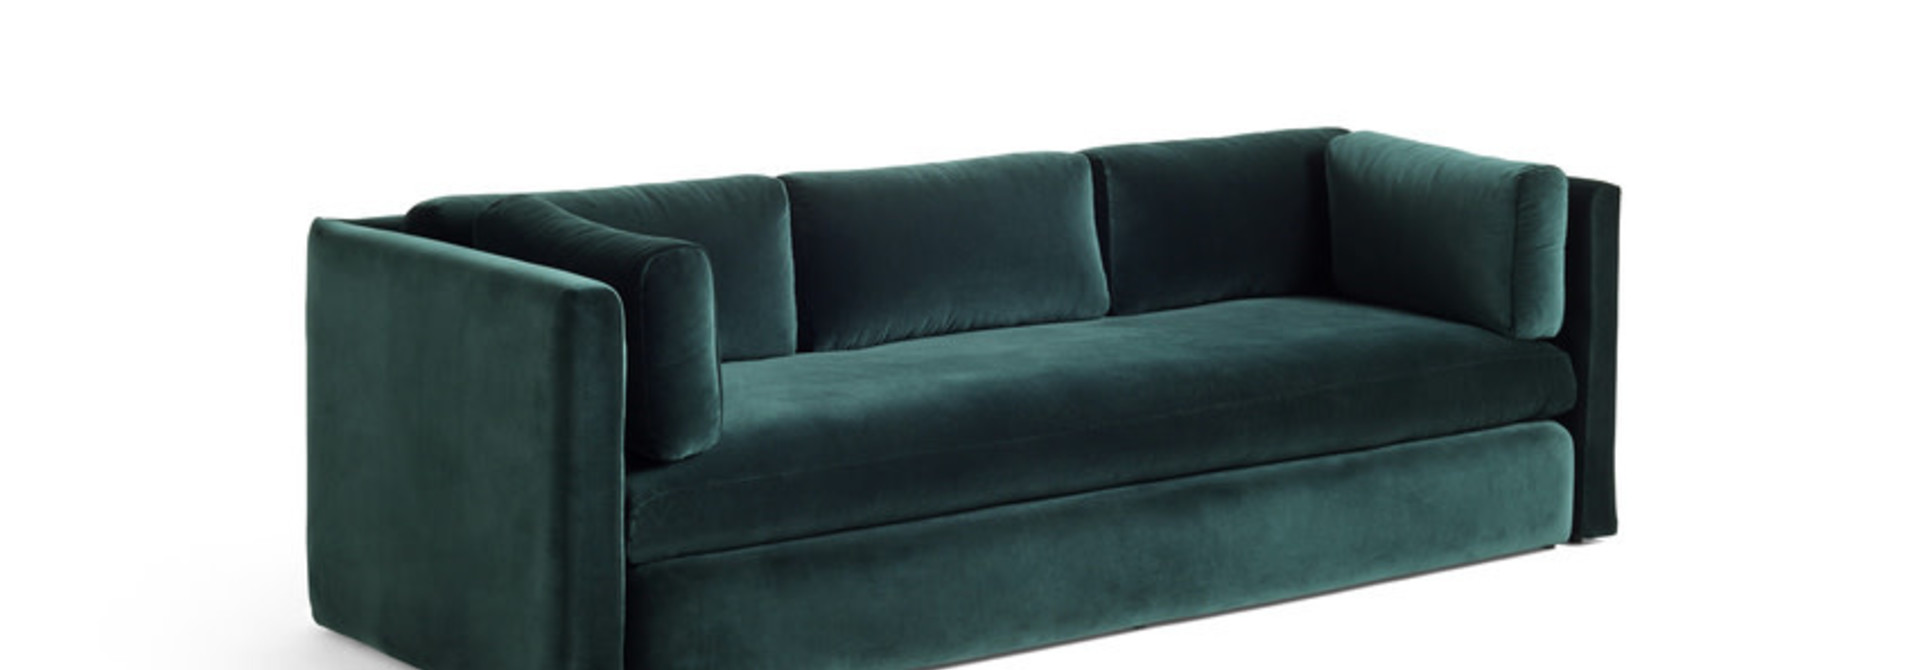 Hackney Sofa 3 seater